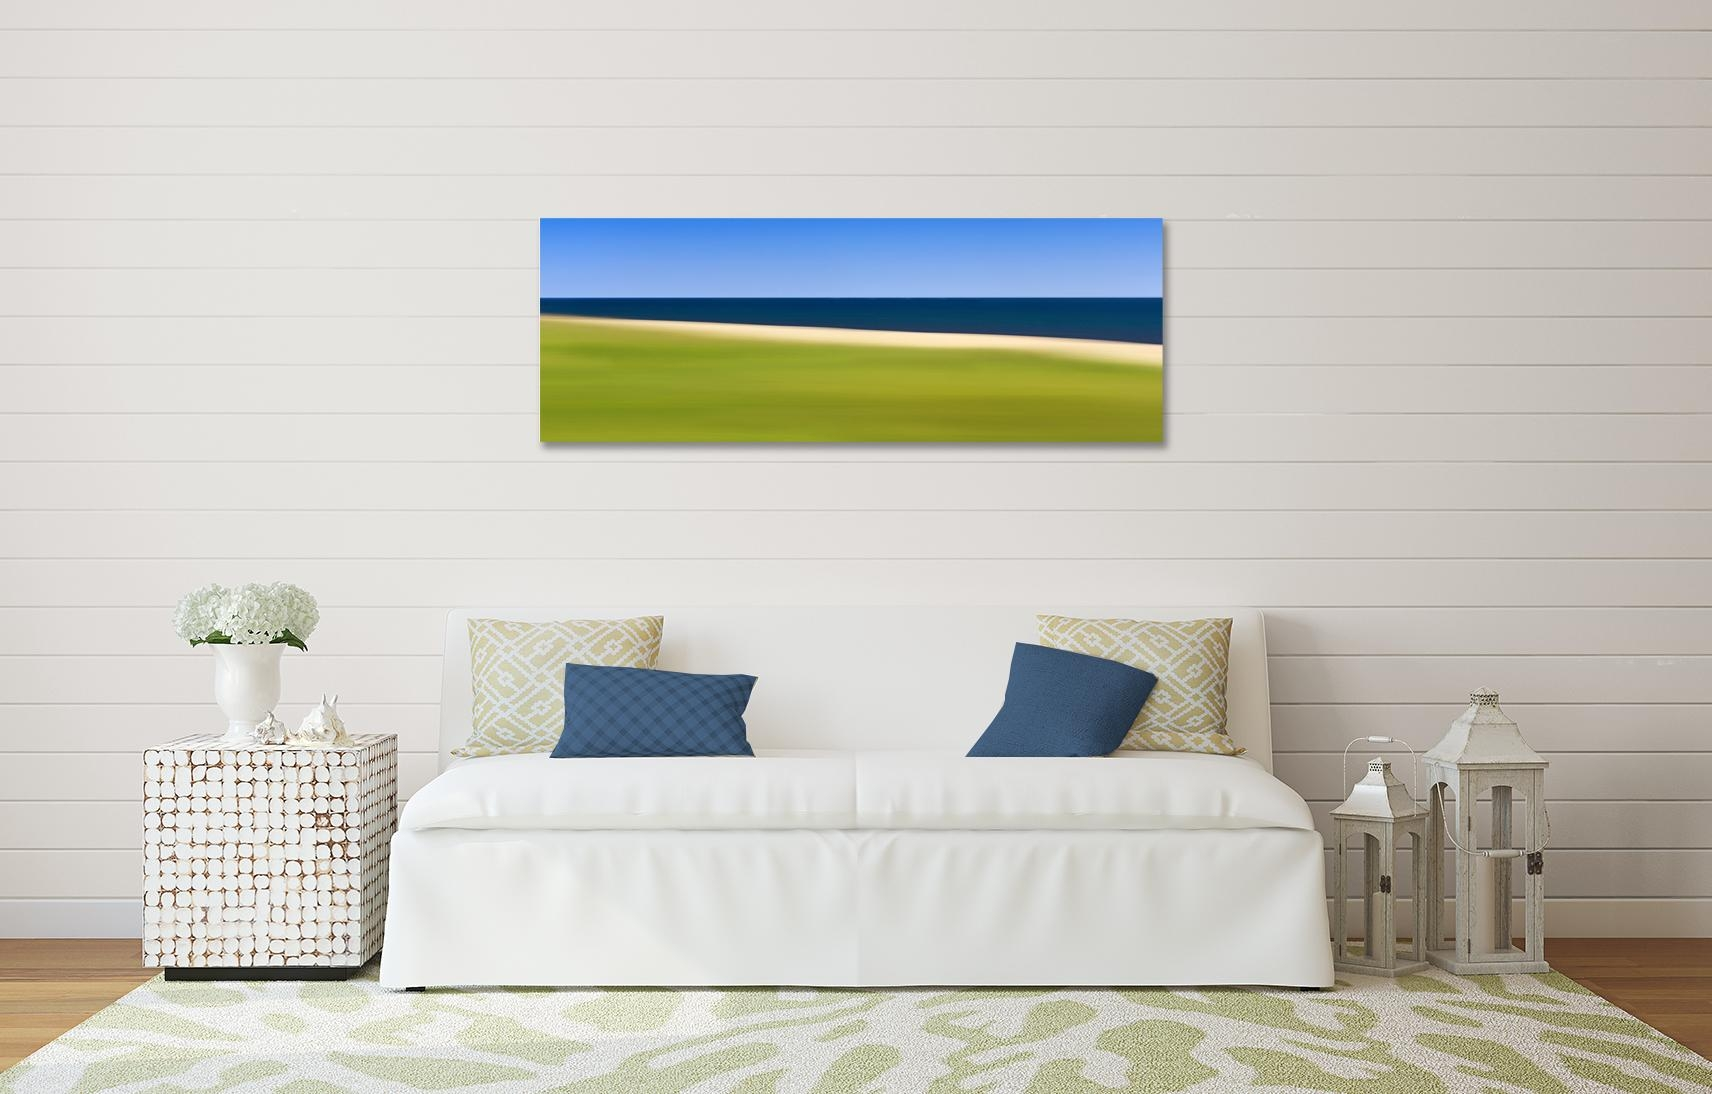 Fine Art Prints For Sale | Abstract Art, Large Canvas Wall Art Regarding Coastal Wall Art (Image 11 of 20)